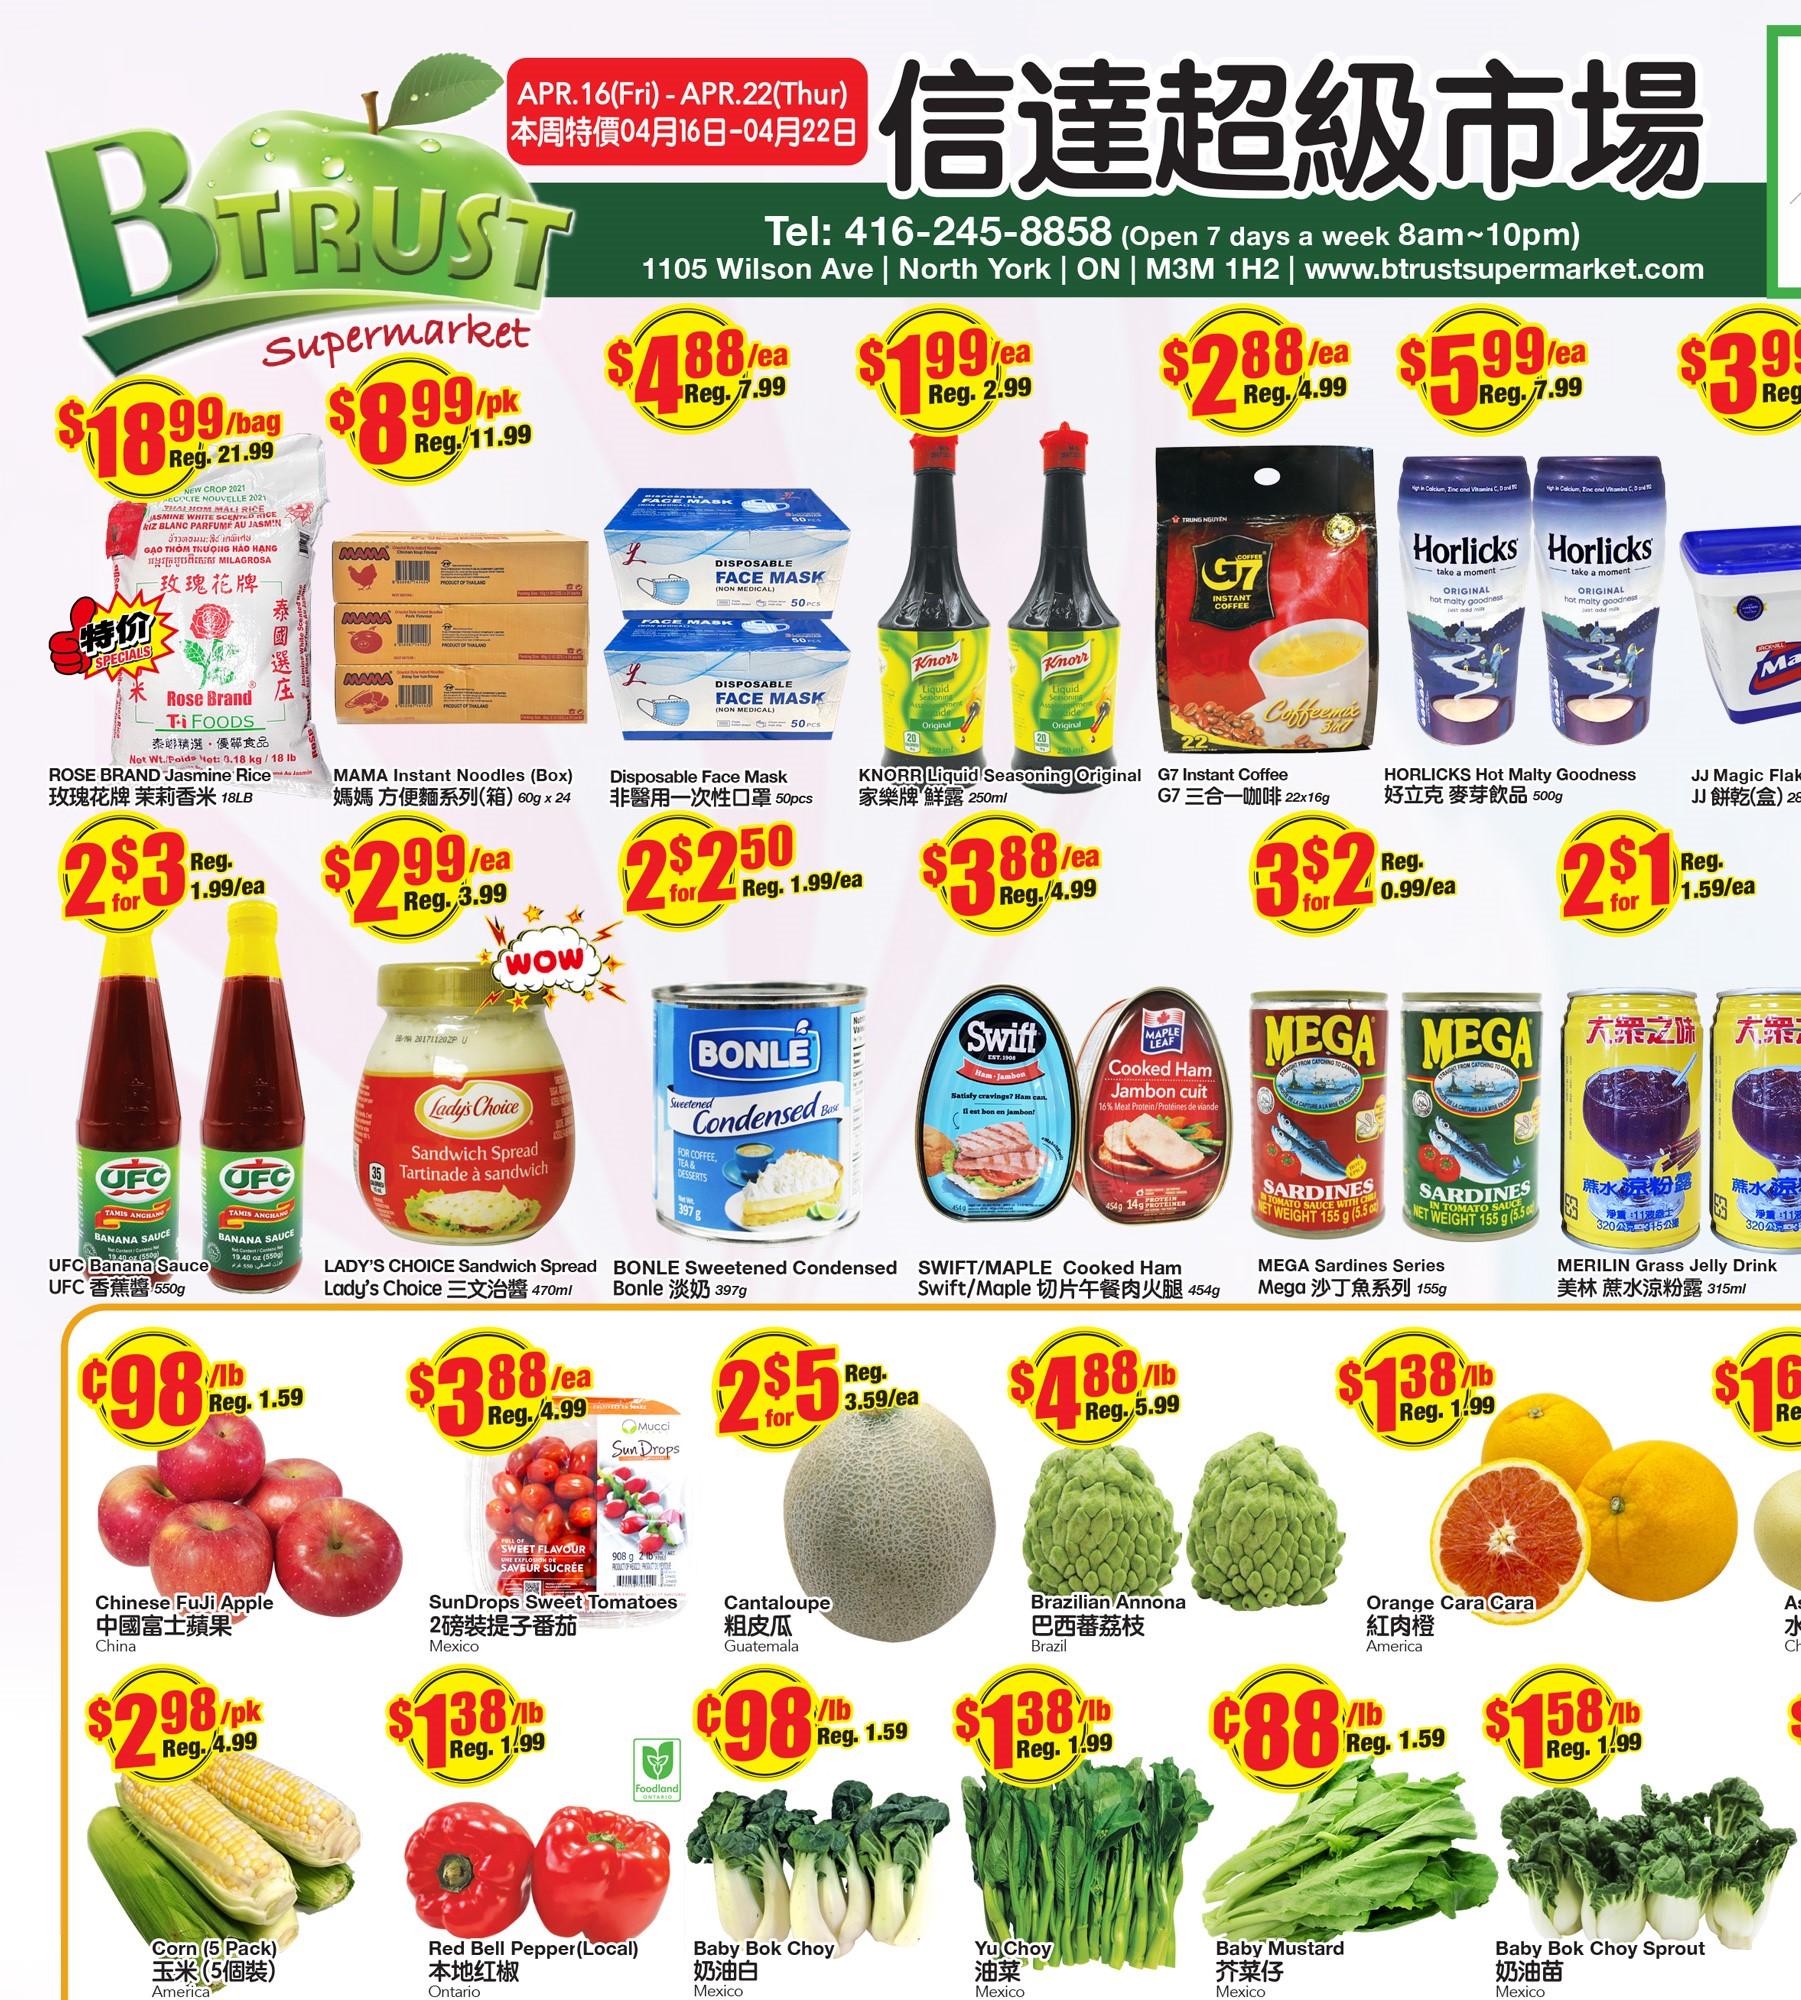 BTrust Supermarket Apr 16